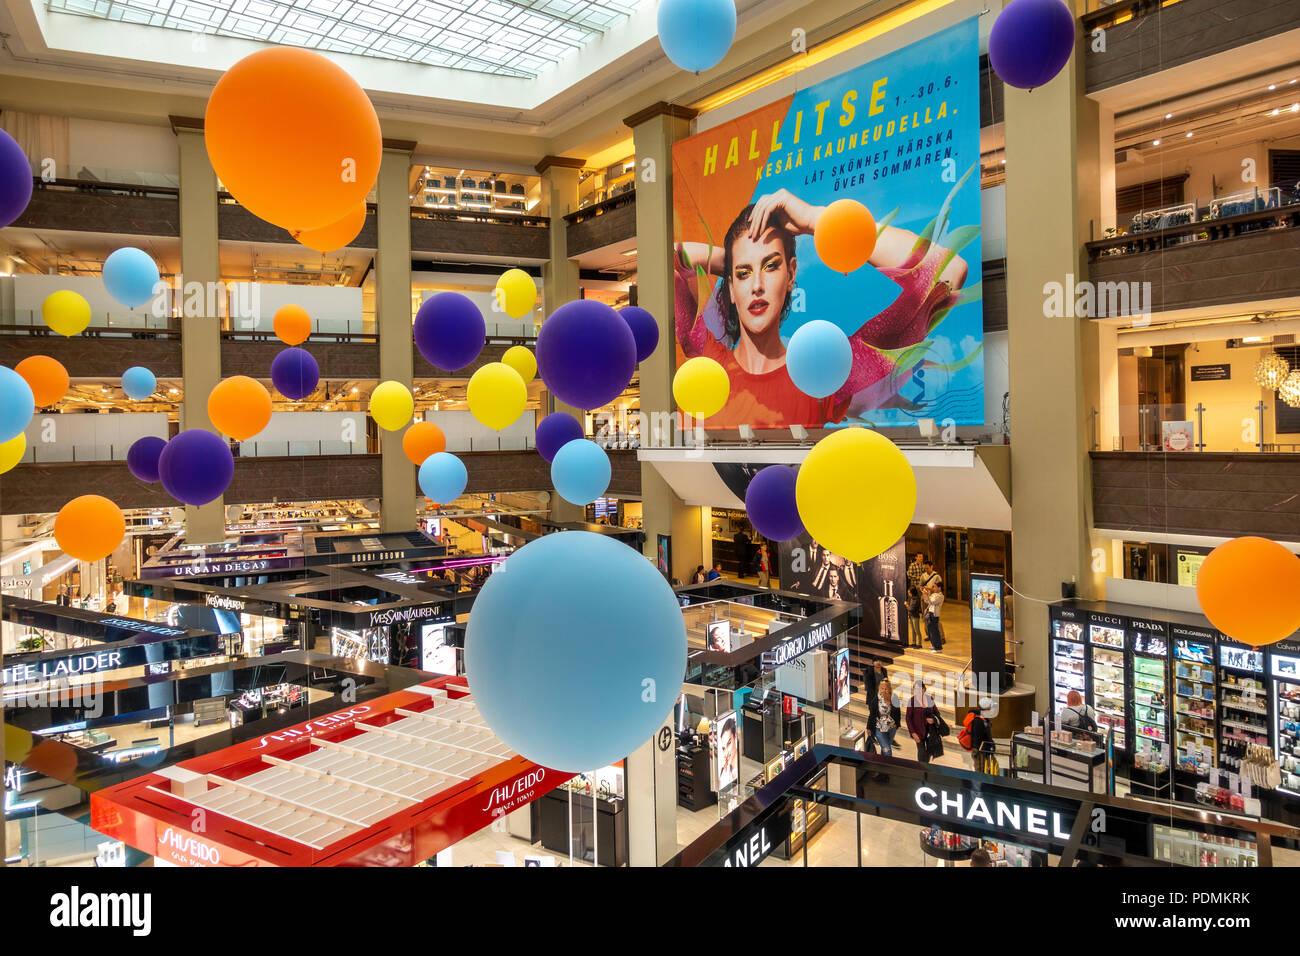 Stockmann department store interior Helsinki shopping - Stock Image